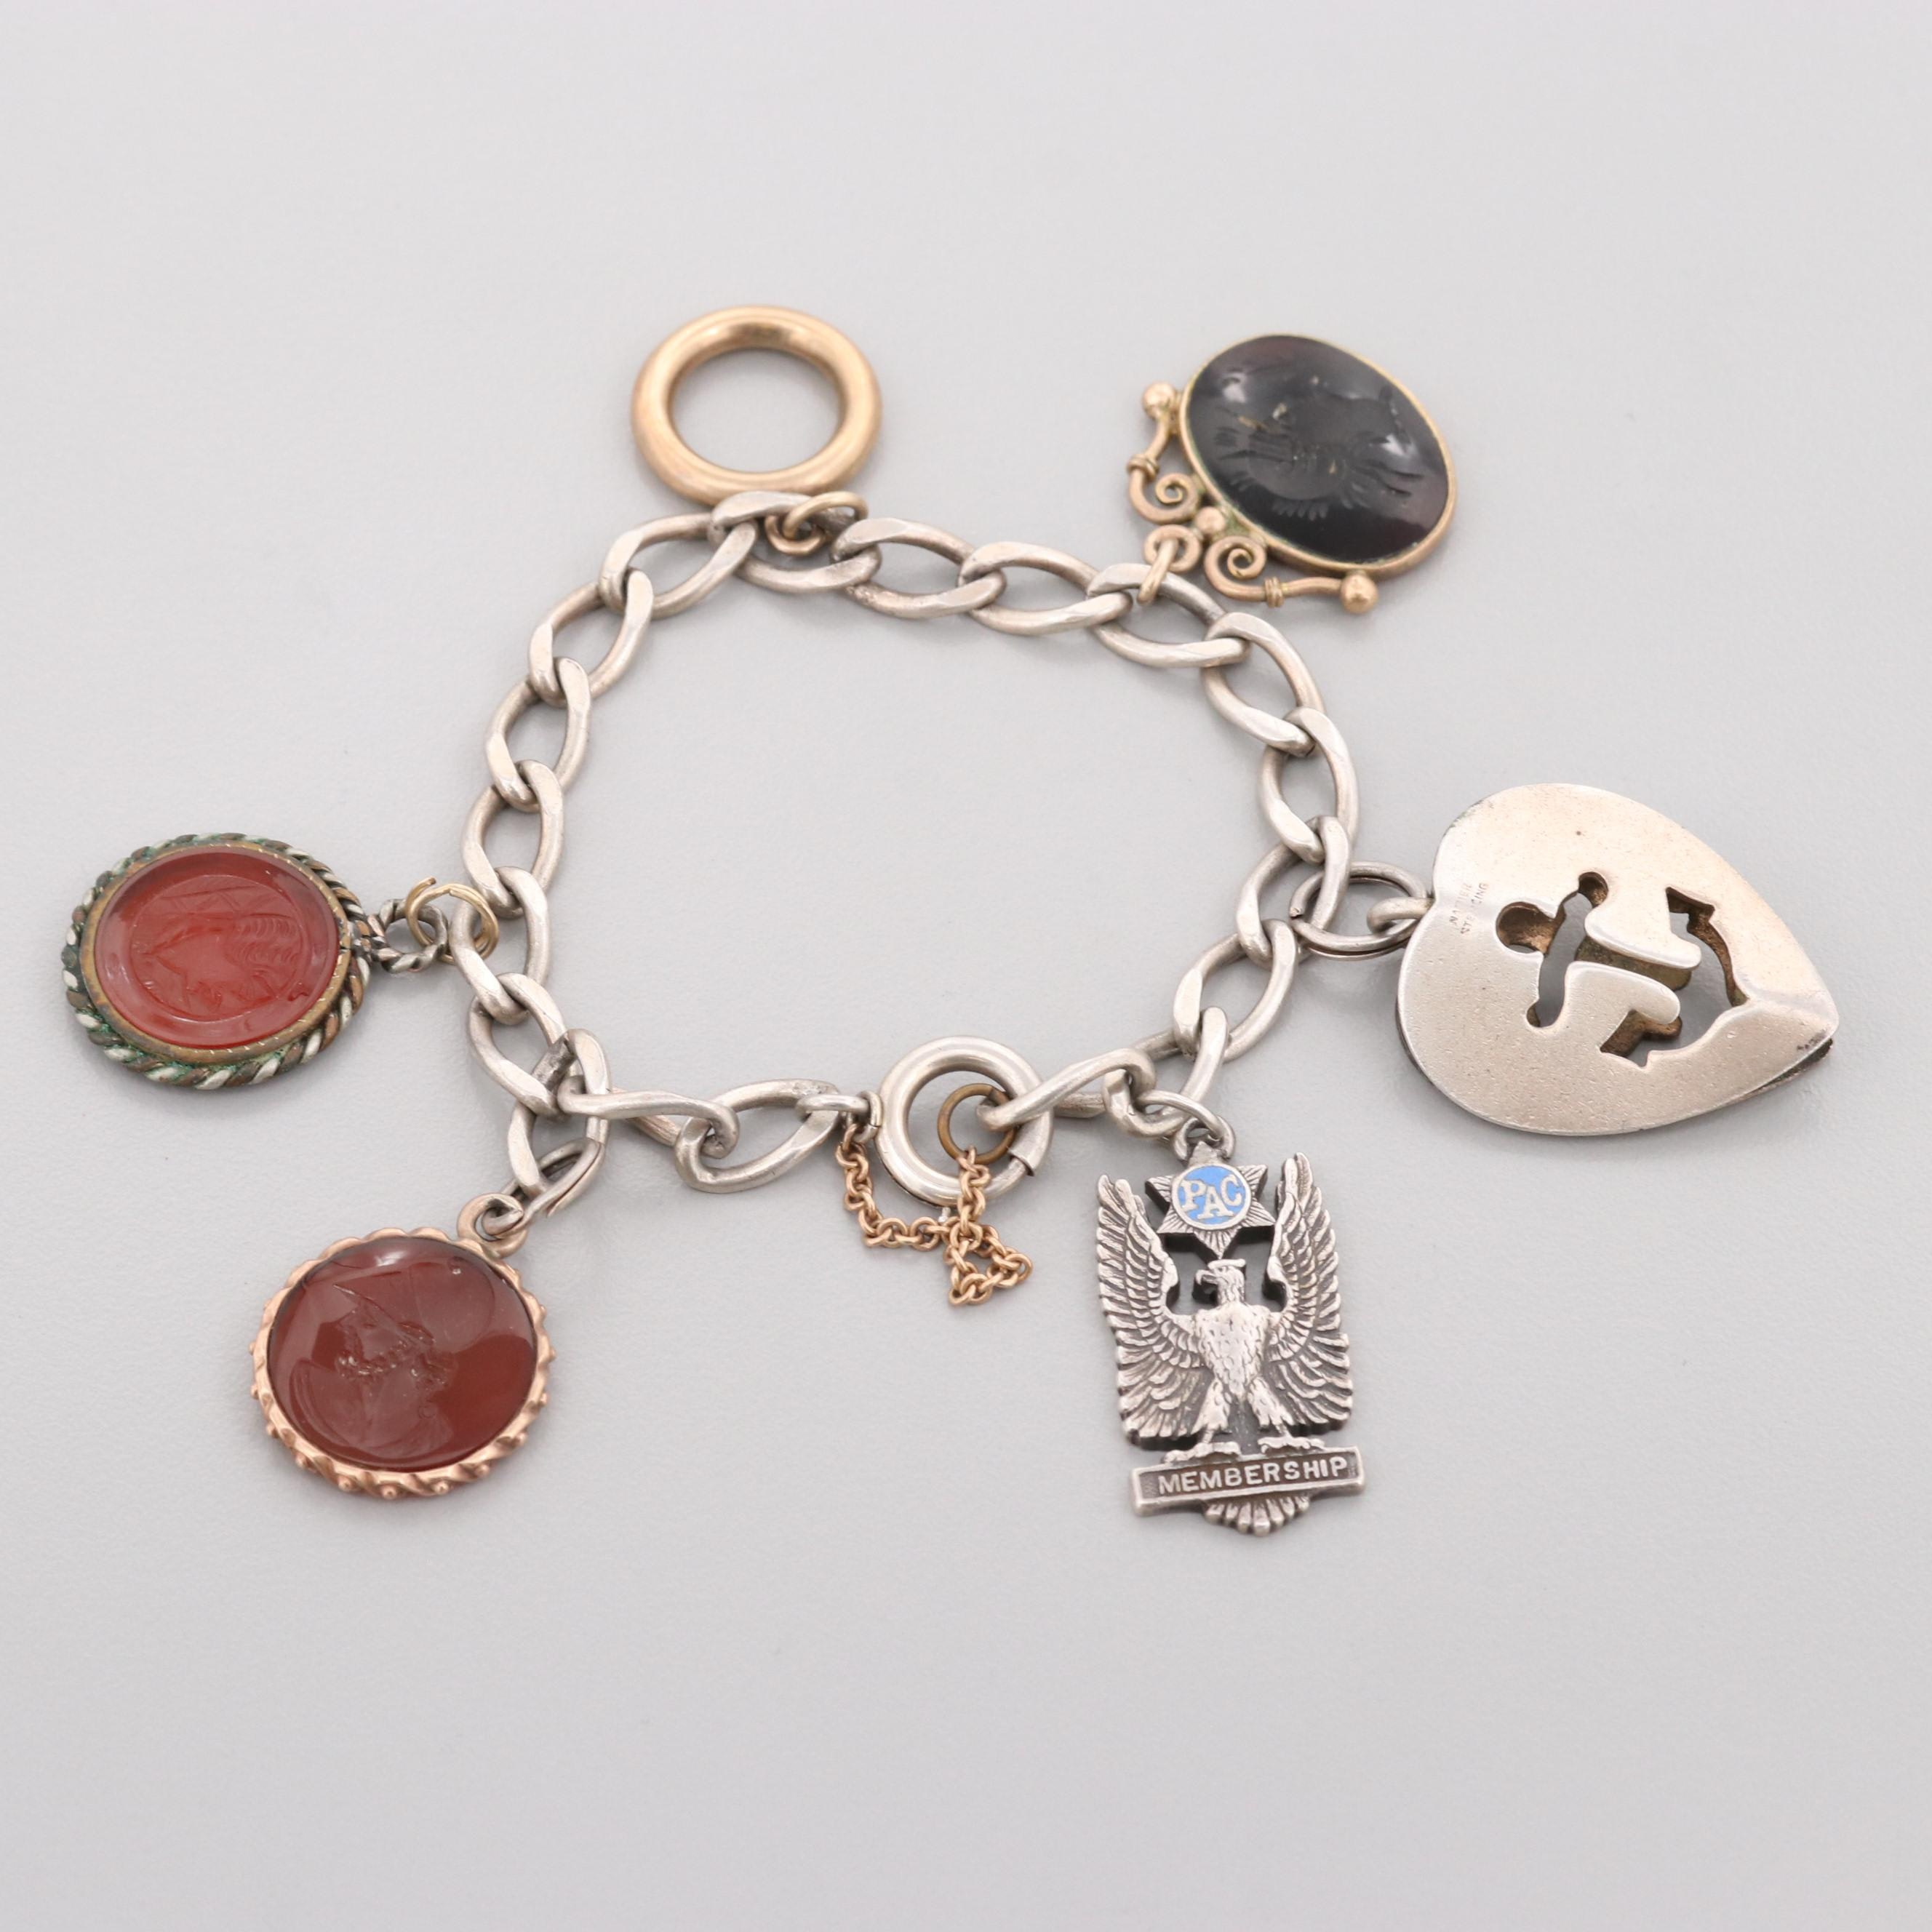 Vintage Sterling Charm Bracelet Including Carnelian, Sard and Gold Tone Charms